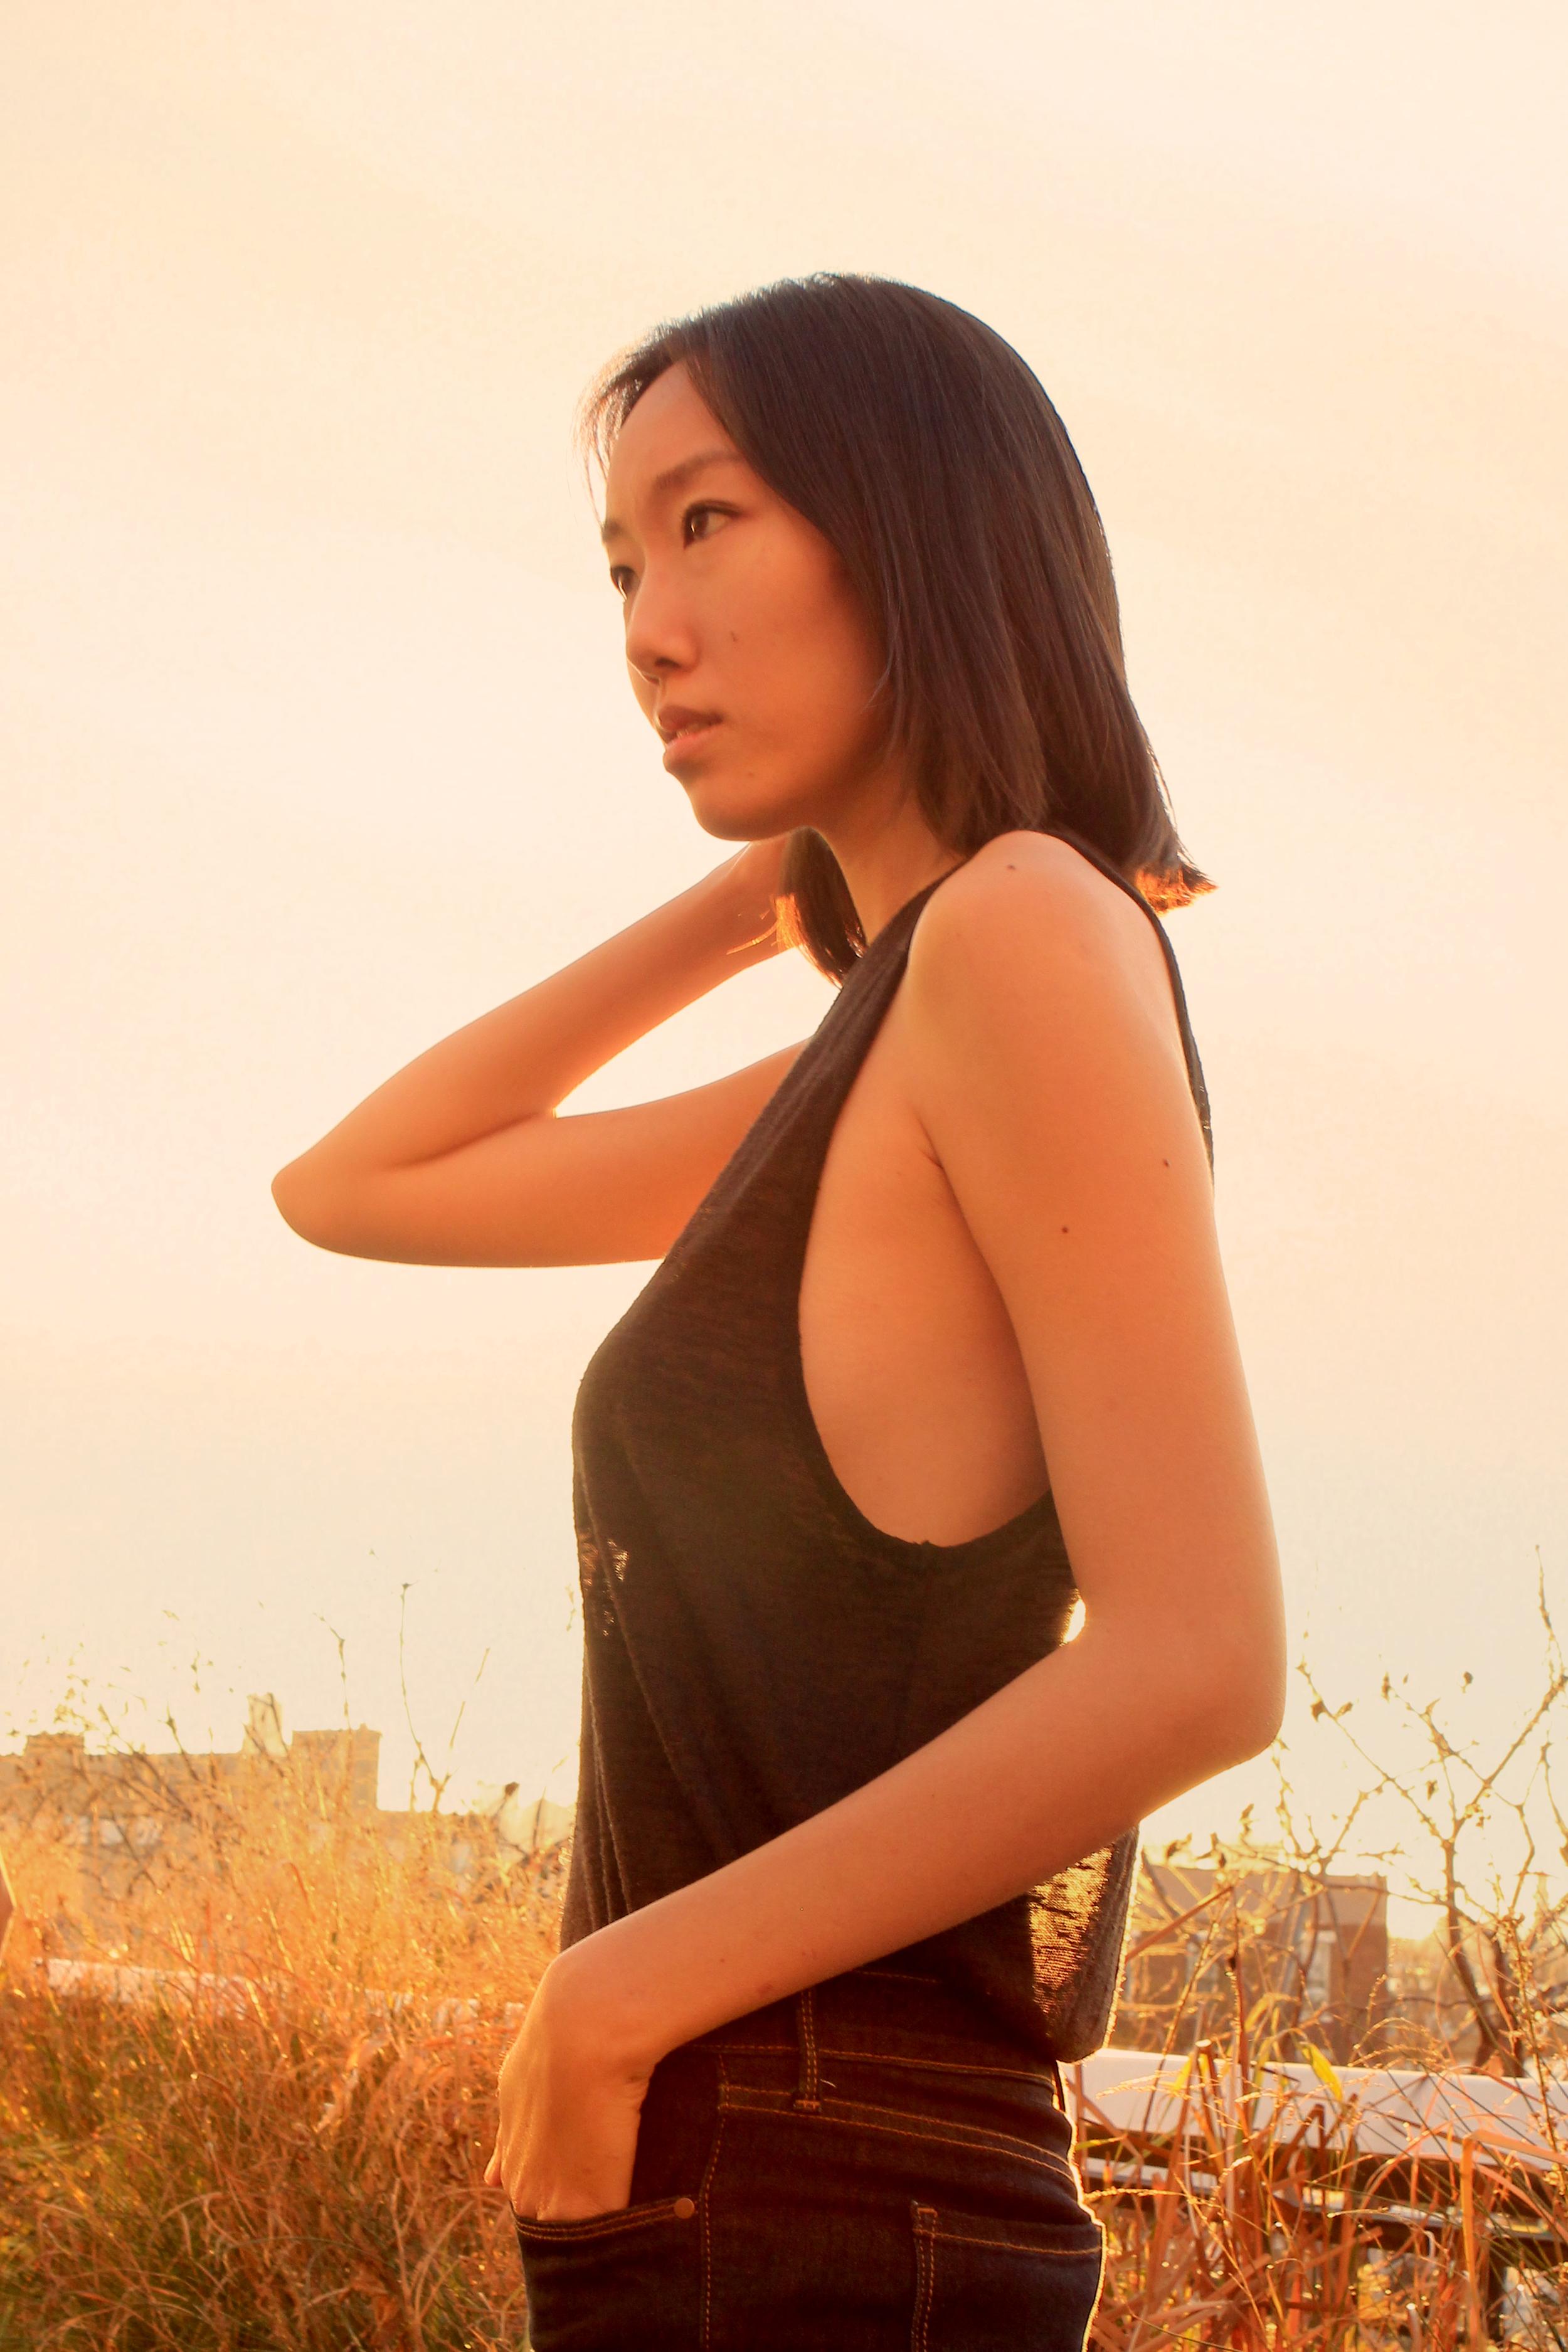 Ilin Chung Photography - Grace Yang - IMG_9006.jpg